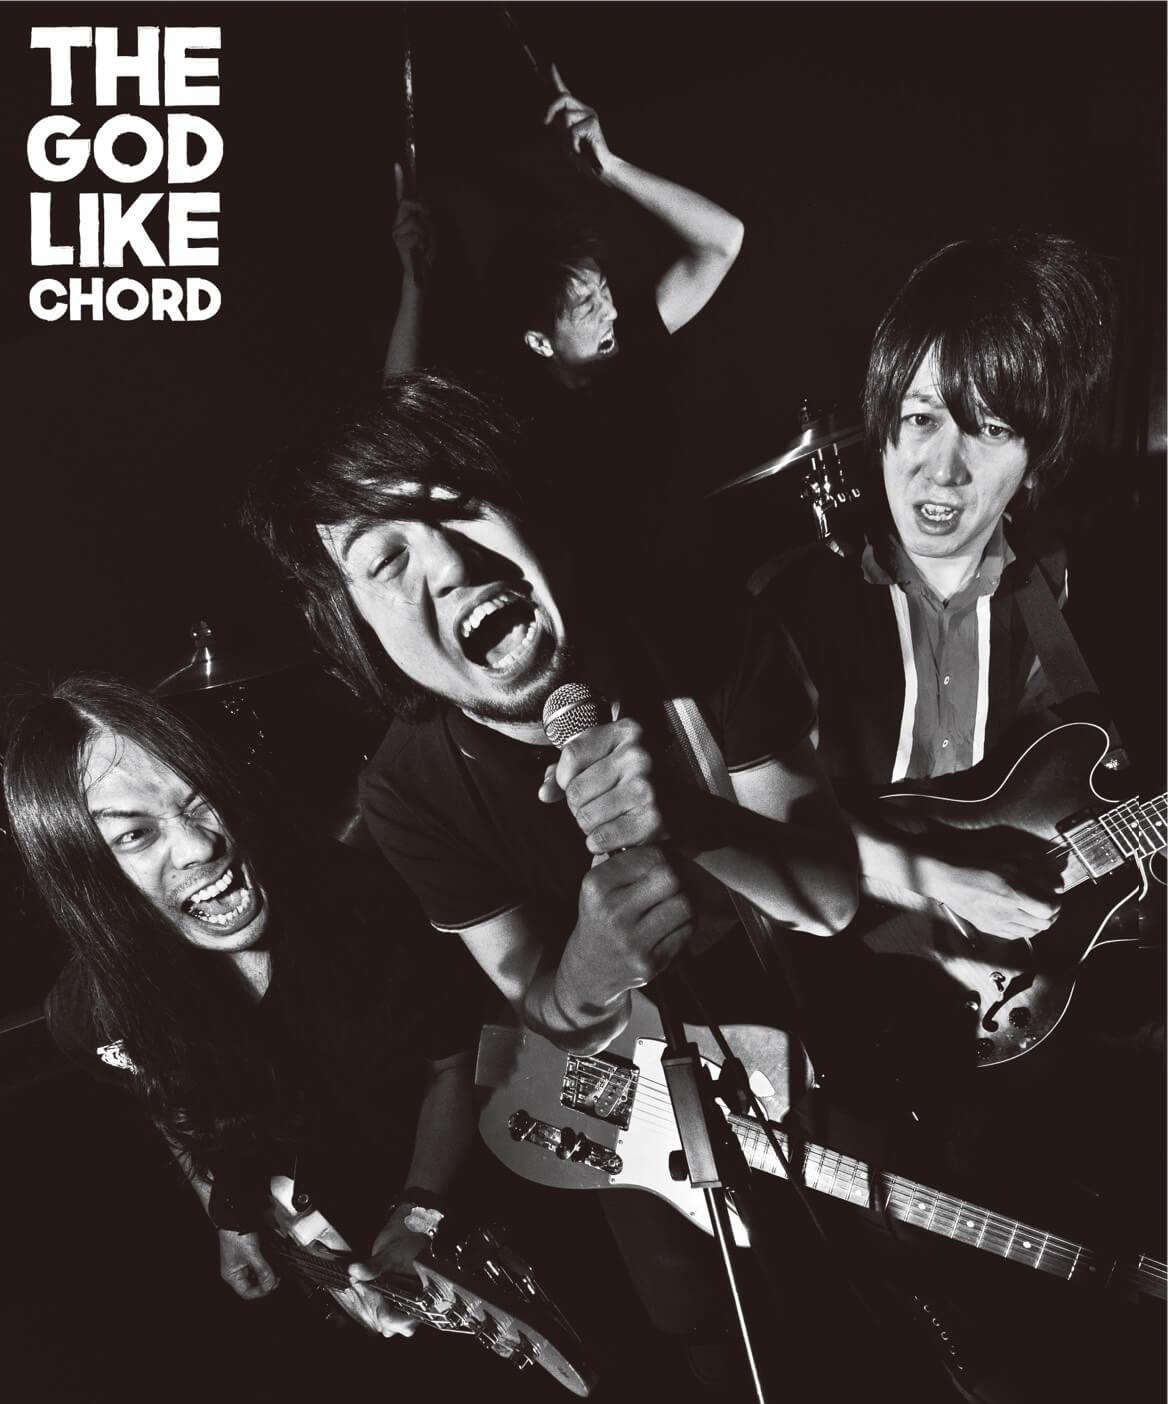 THE GOD LIKE CHORD、初のMVを解禁&タワーレコード限定無料サンプラーをゲリラリリースサムネイル画像